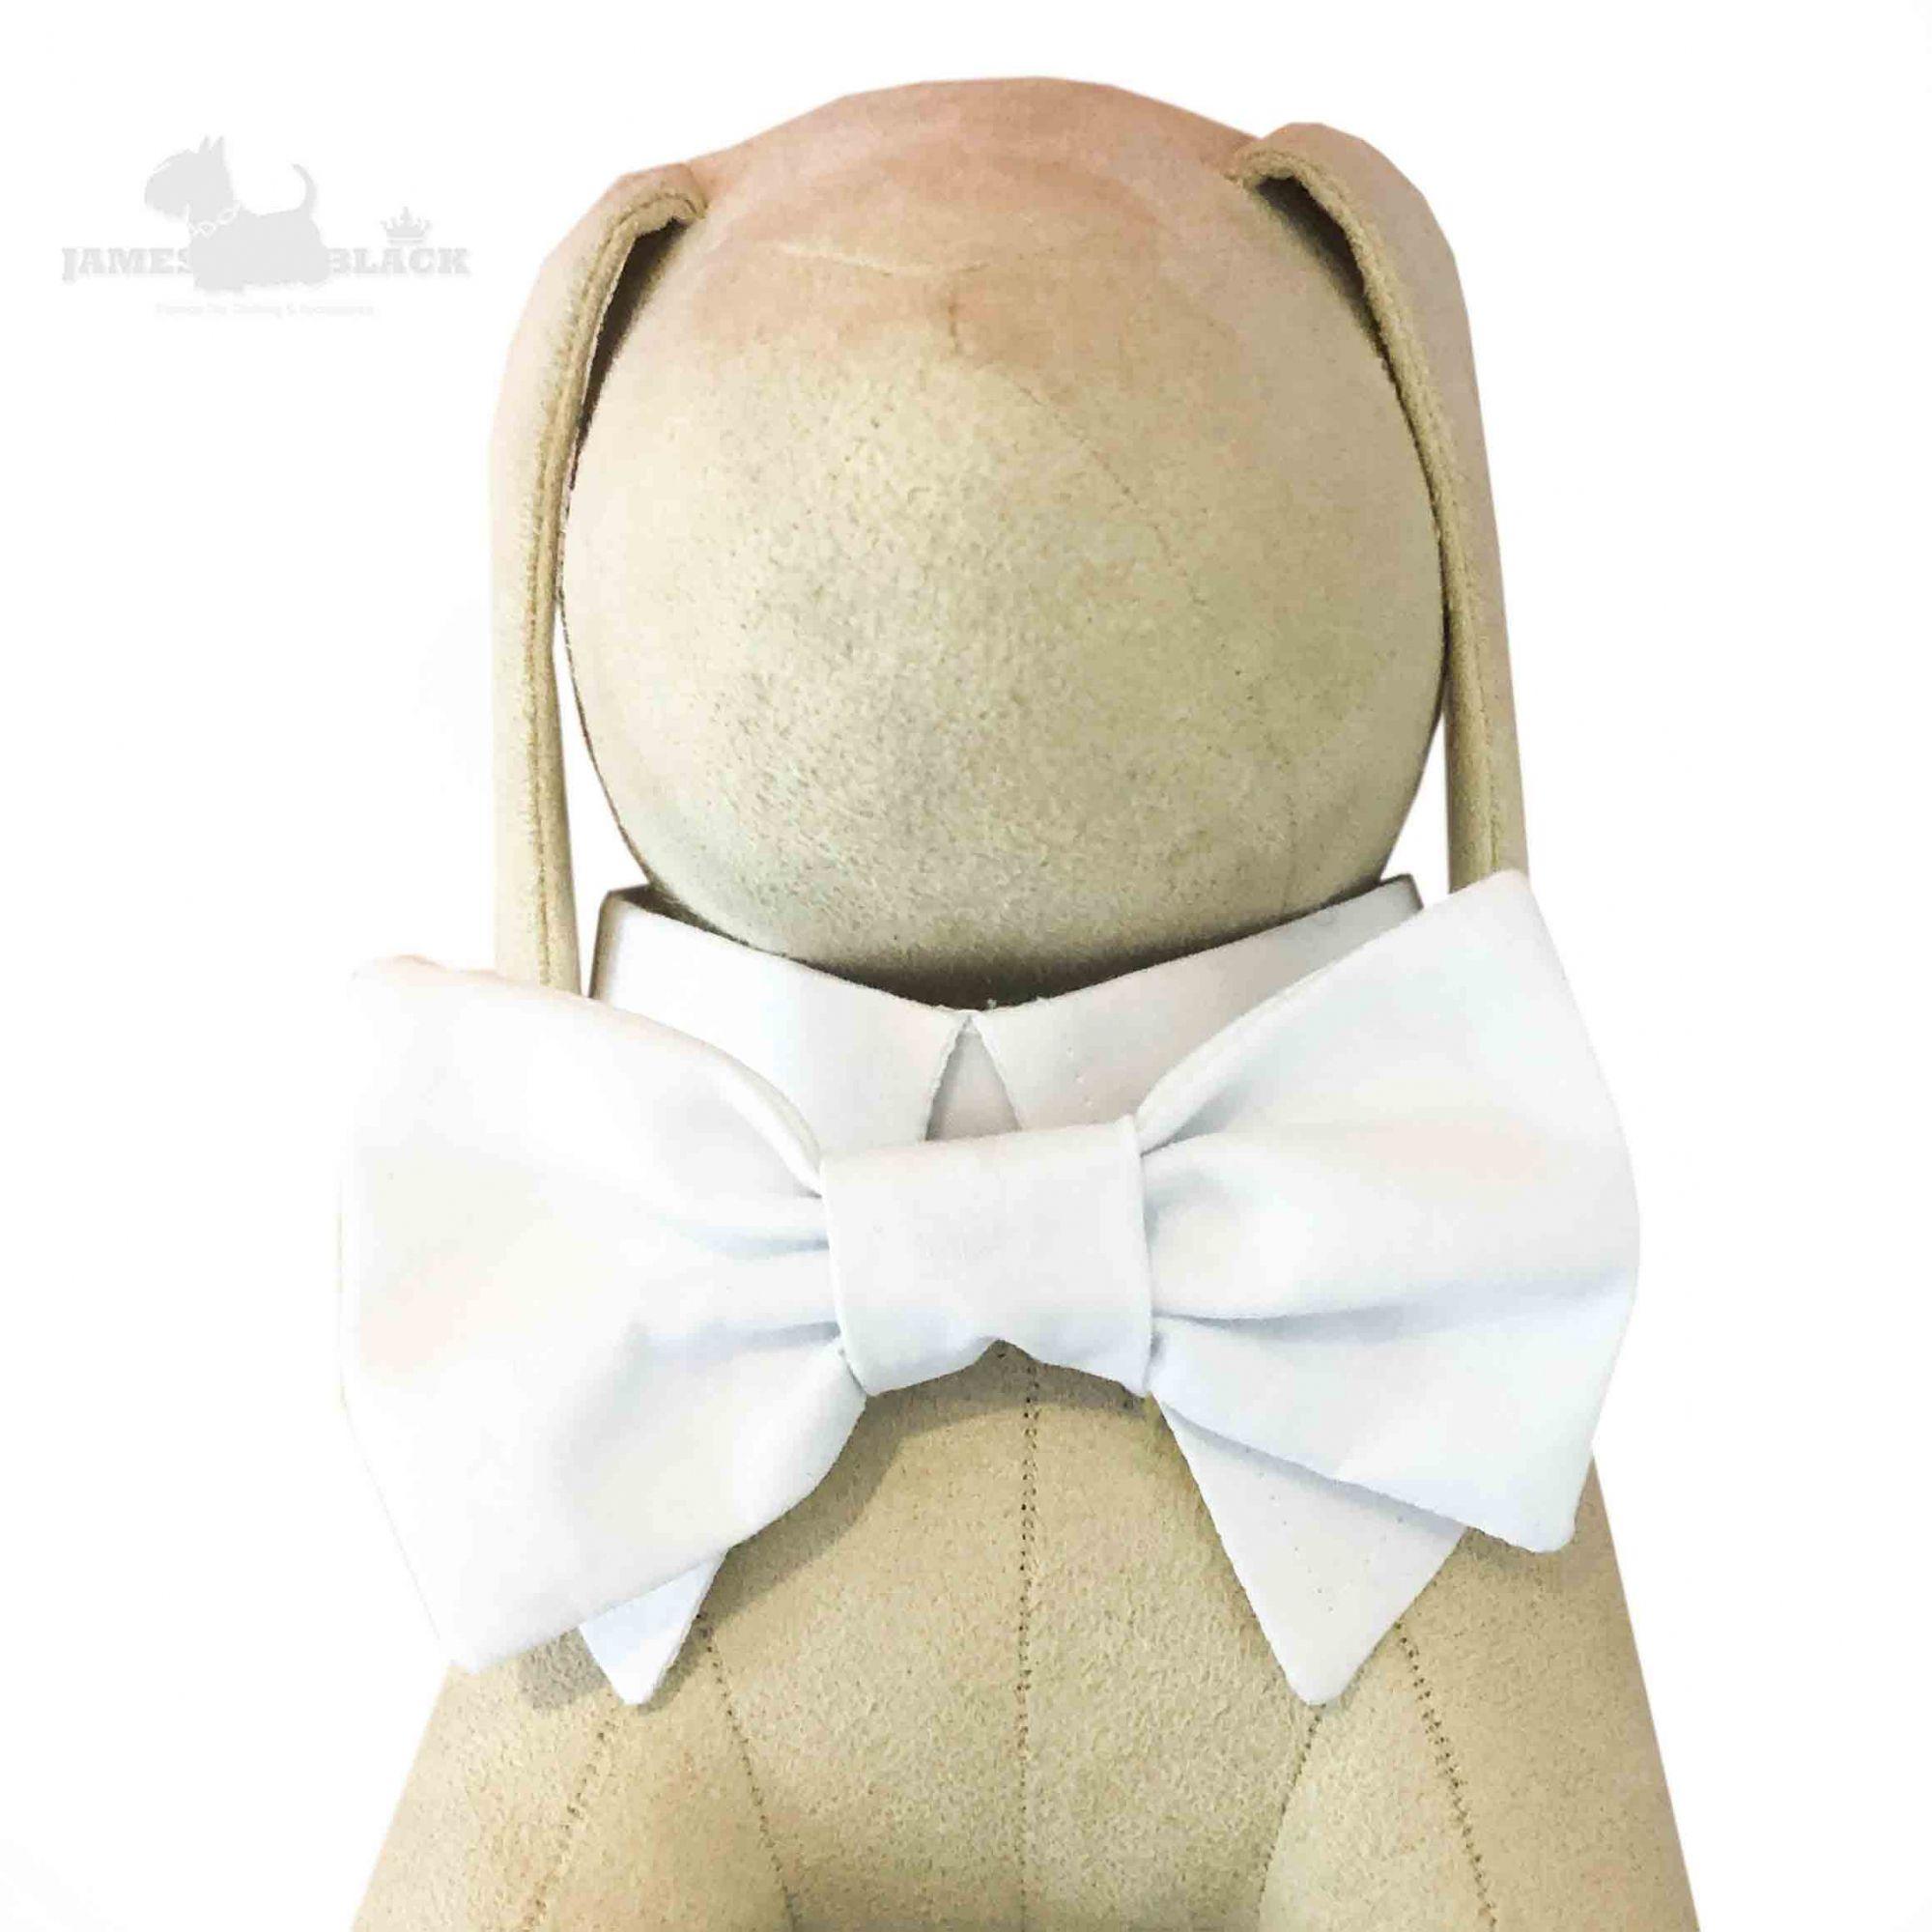 Colarinho com Gravata removível Branco